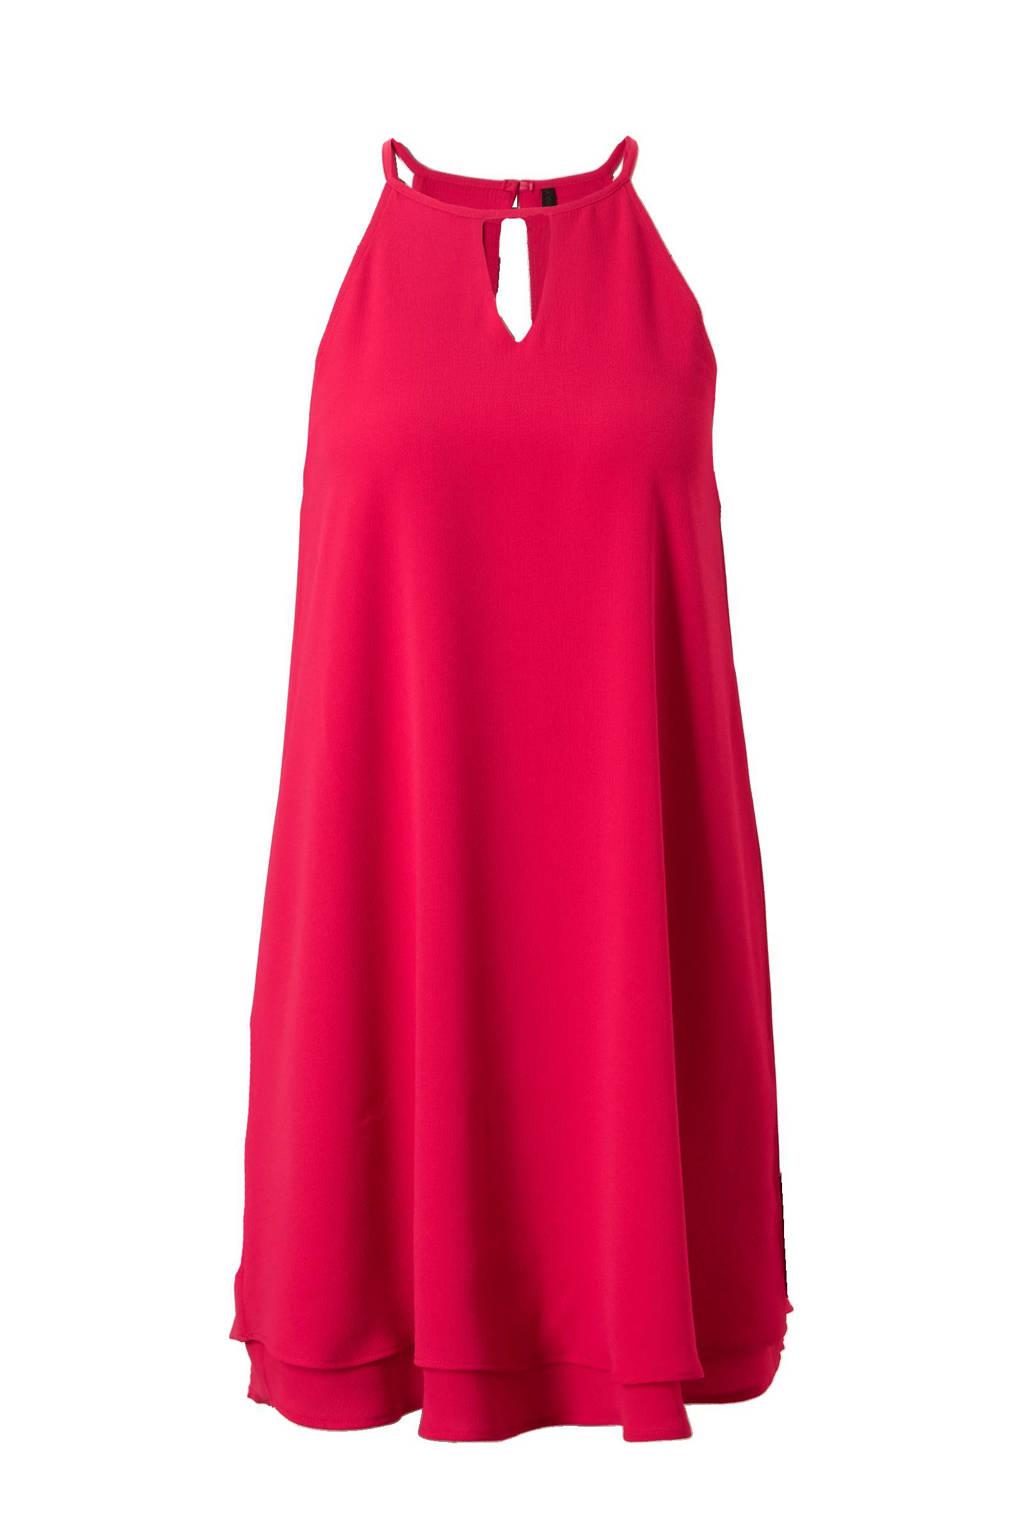 ONLY jurk, Roze